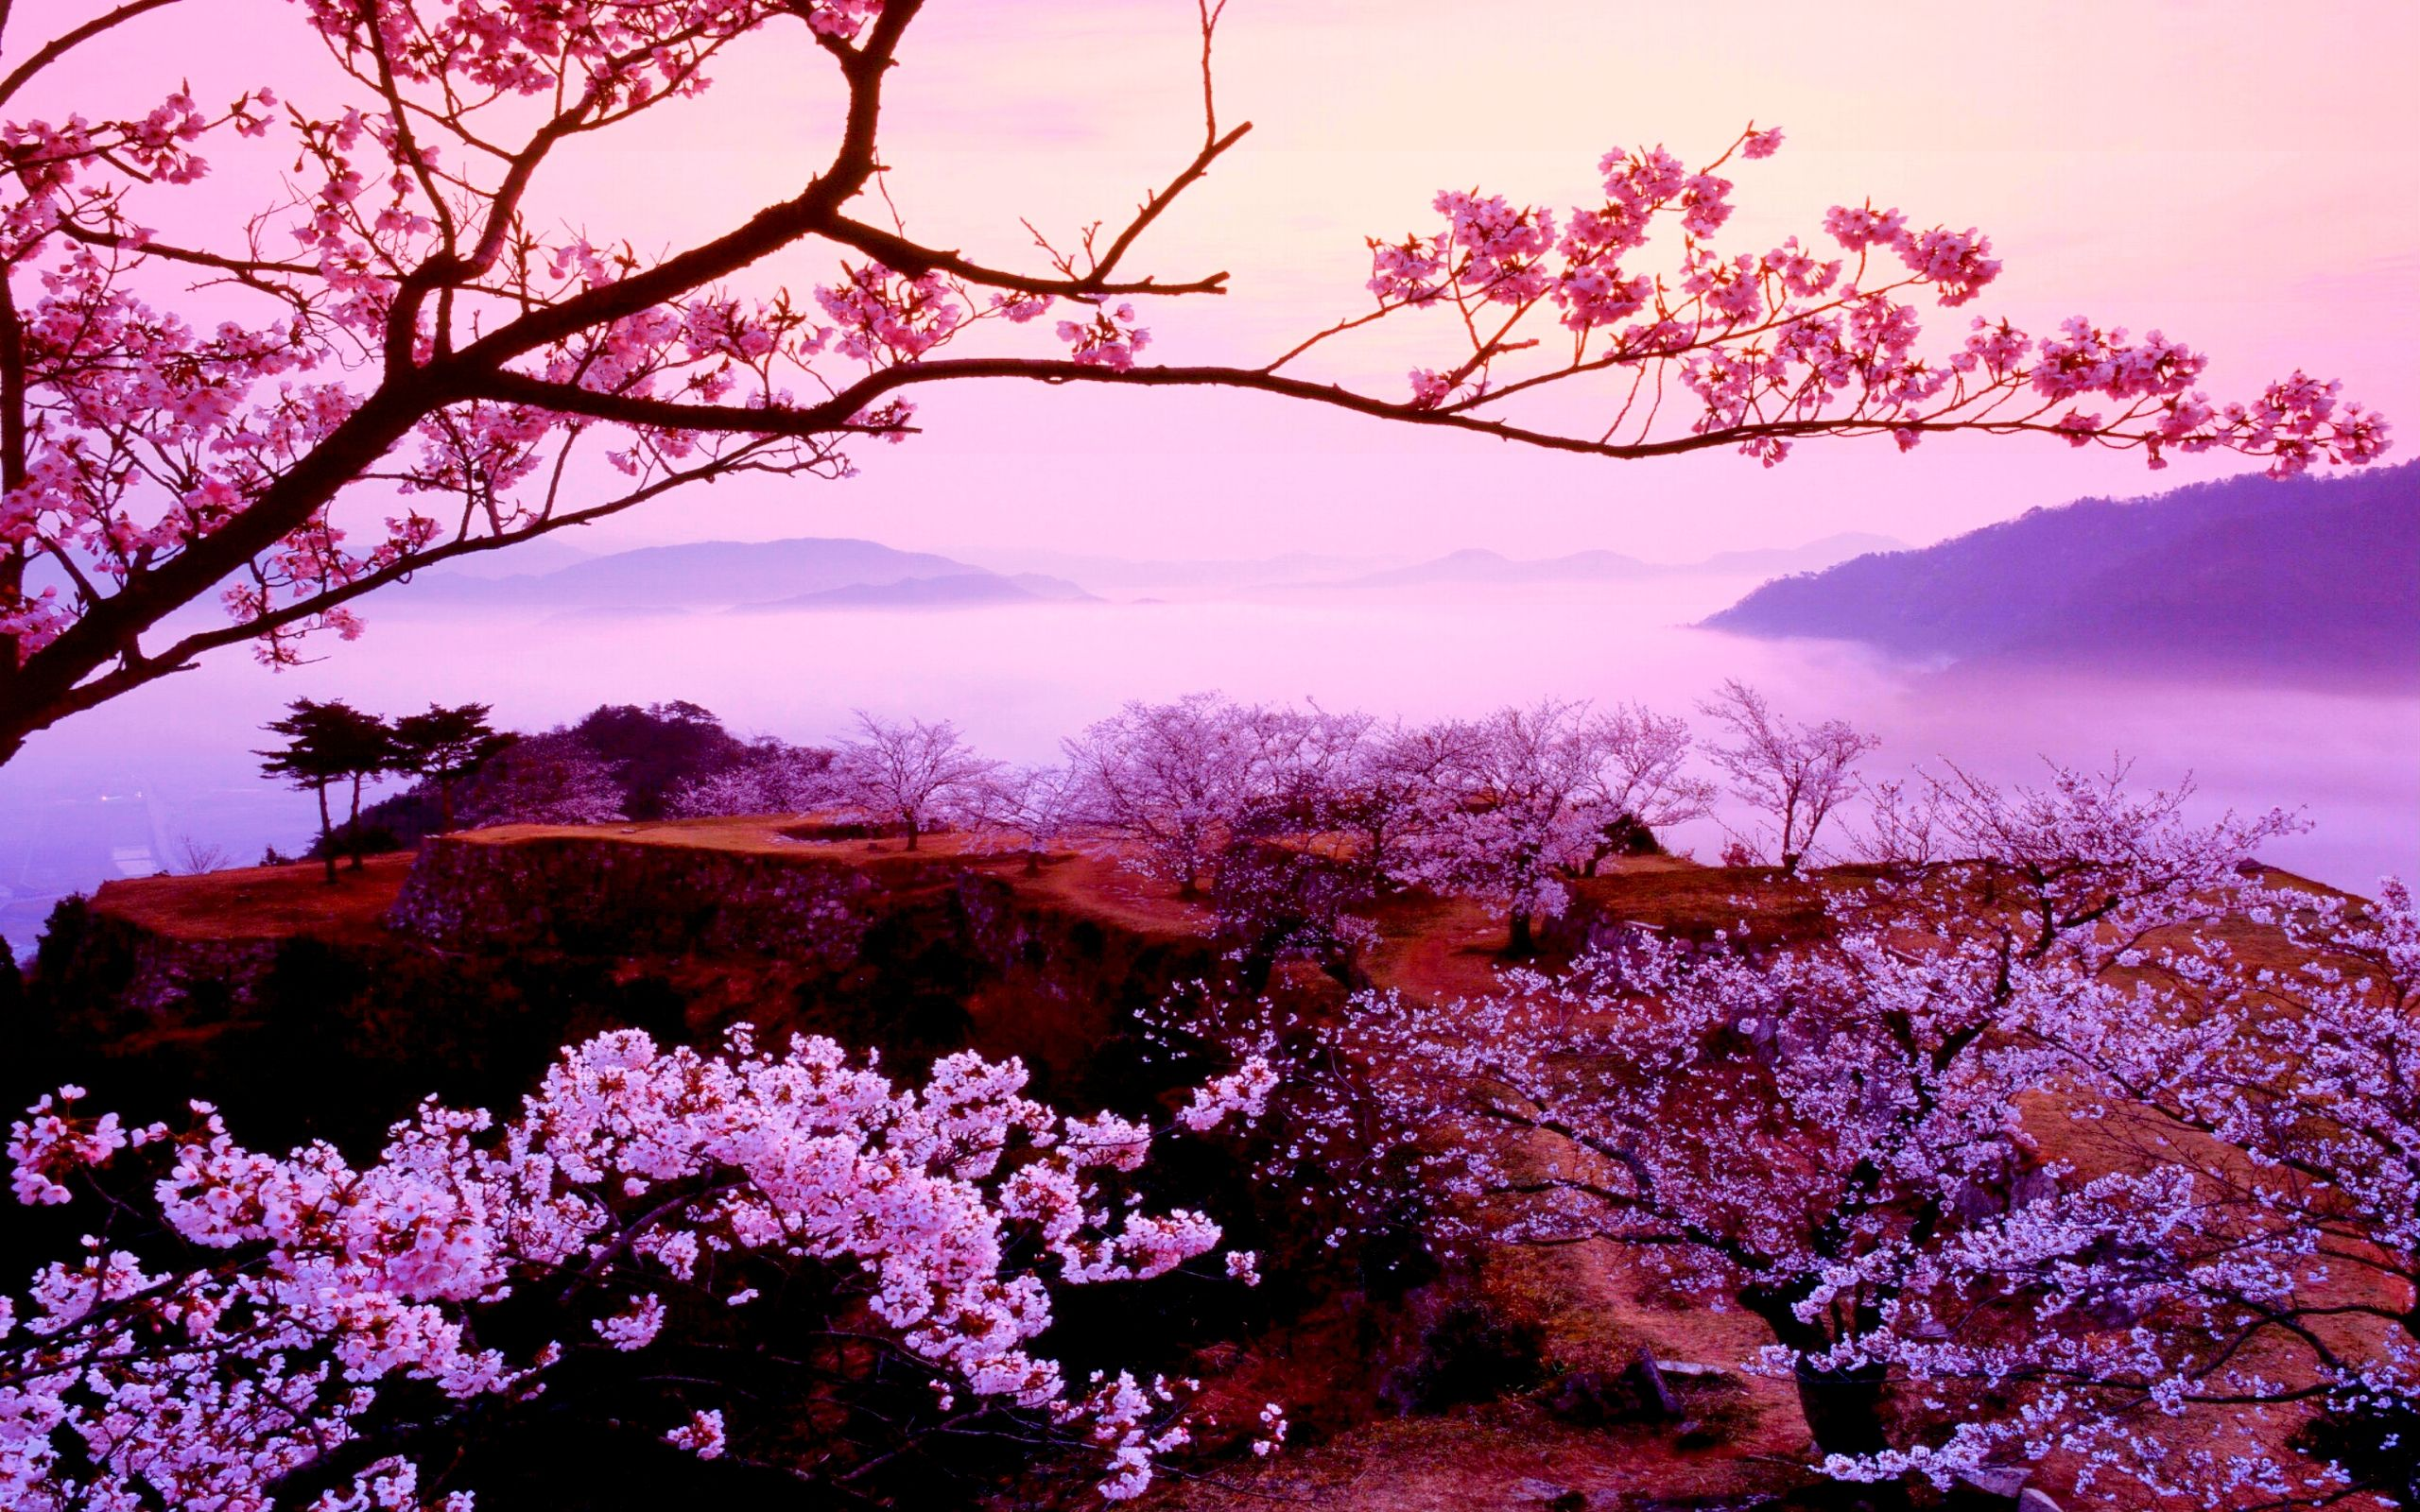 1724503 2560x1600 sakura 2560 1600 nature pinterest japan and paintings. Black Bedroom Furniture Sets. Home Design Ideas